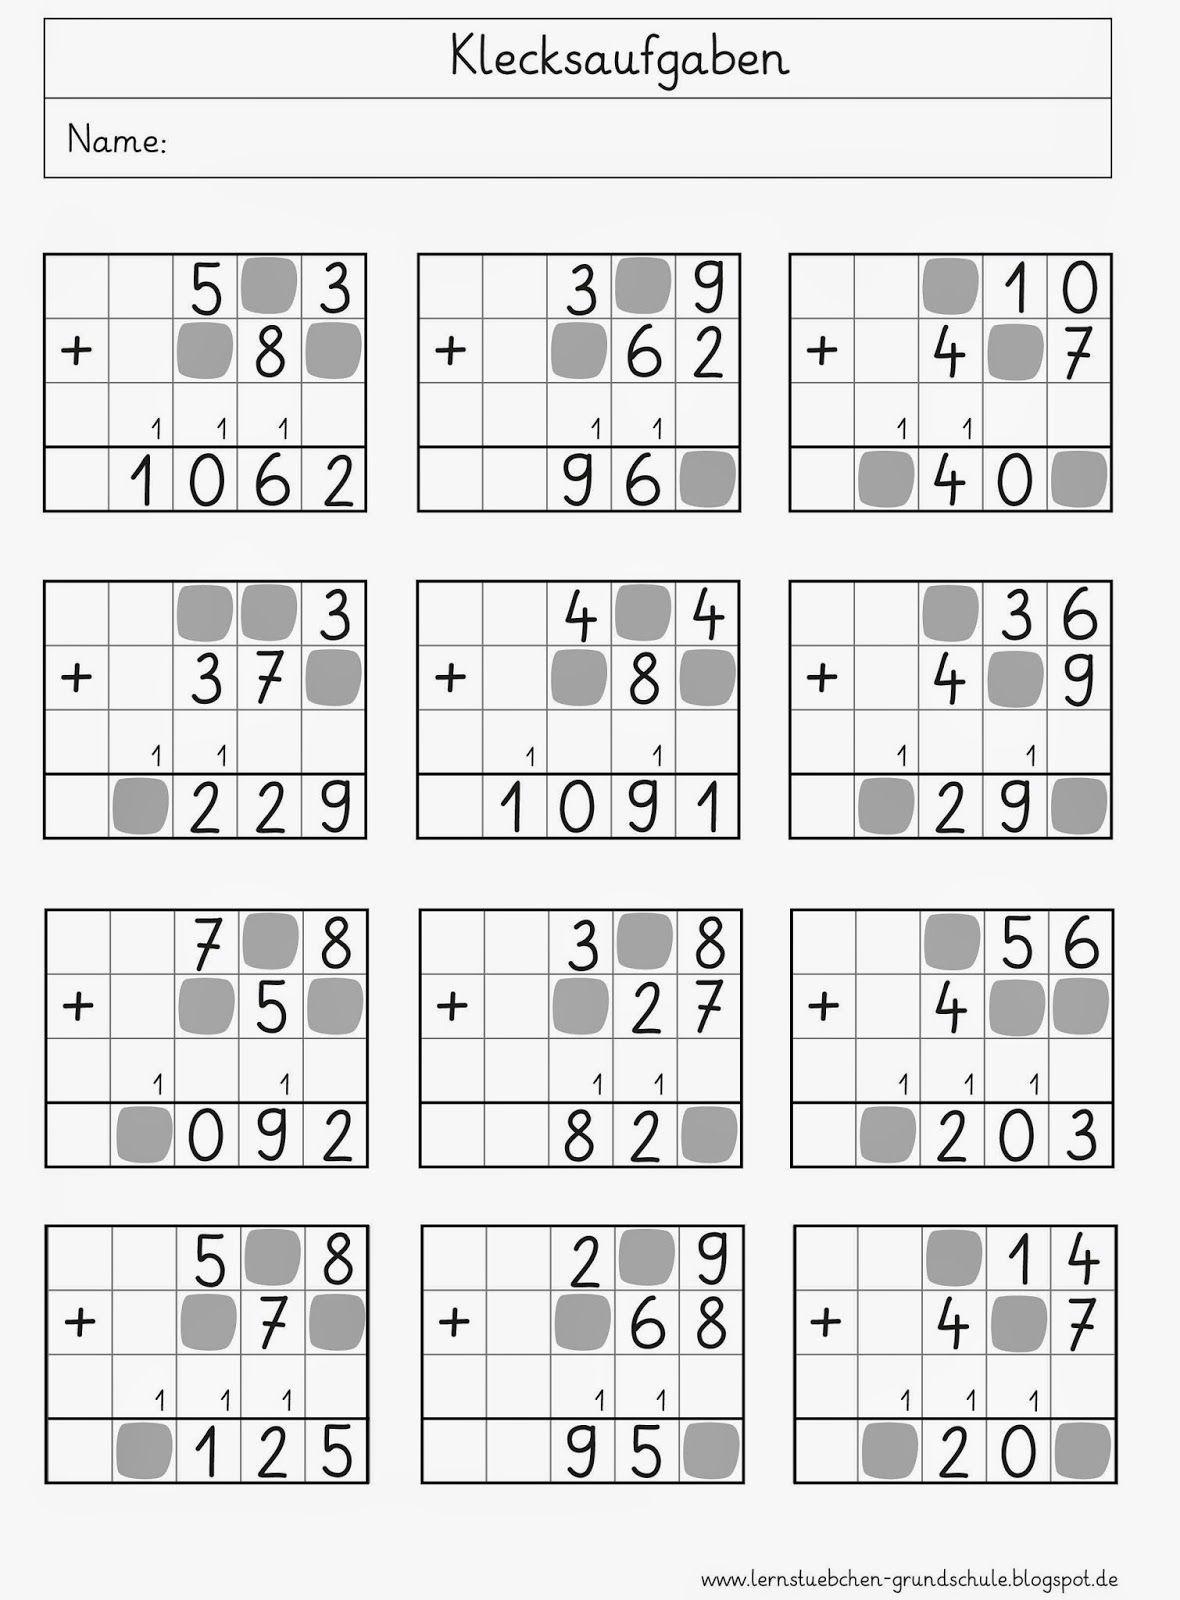 Lernstübchen: Klecksaufgaben | Schule Mathe | Pinterest | Mathe ...